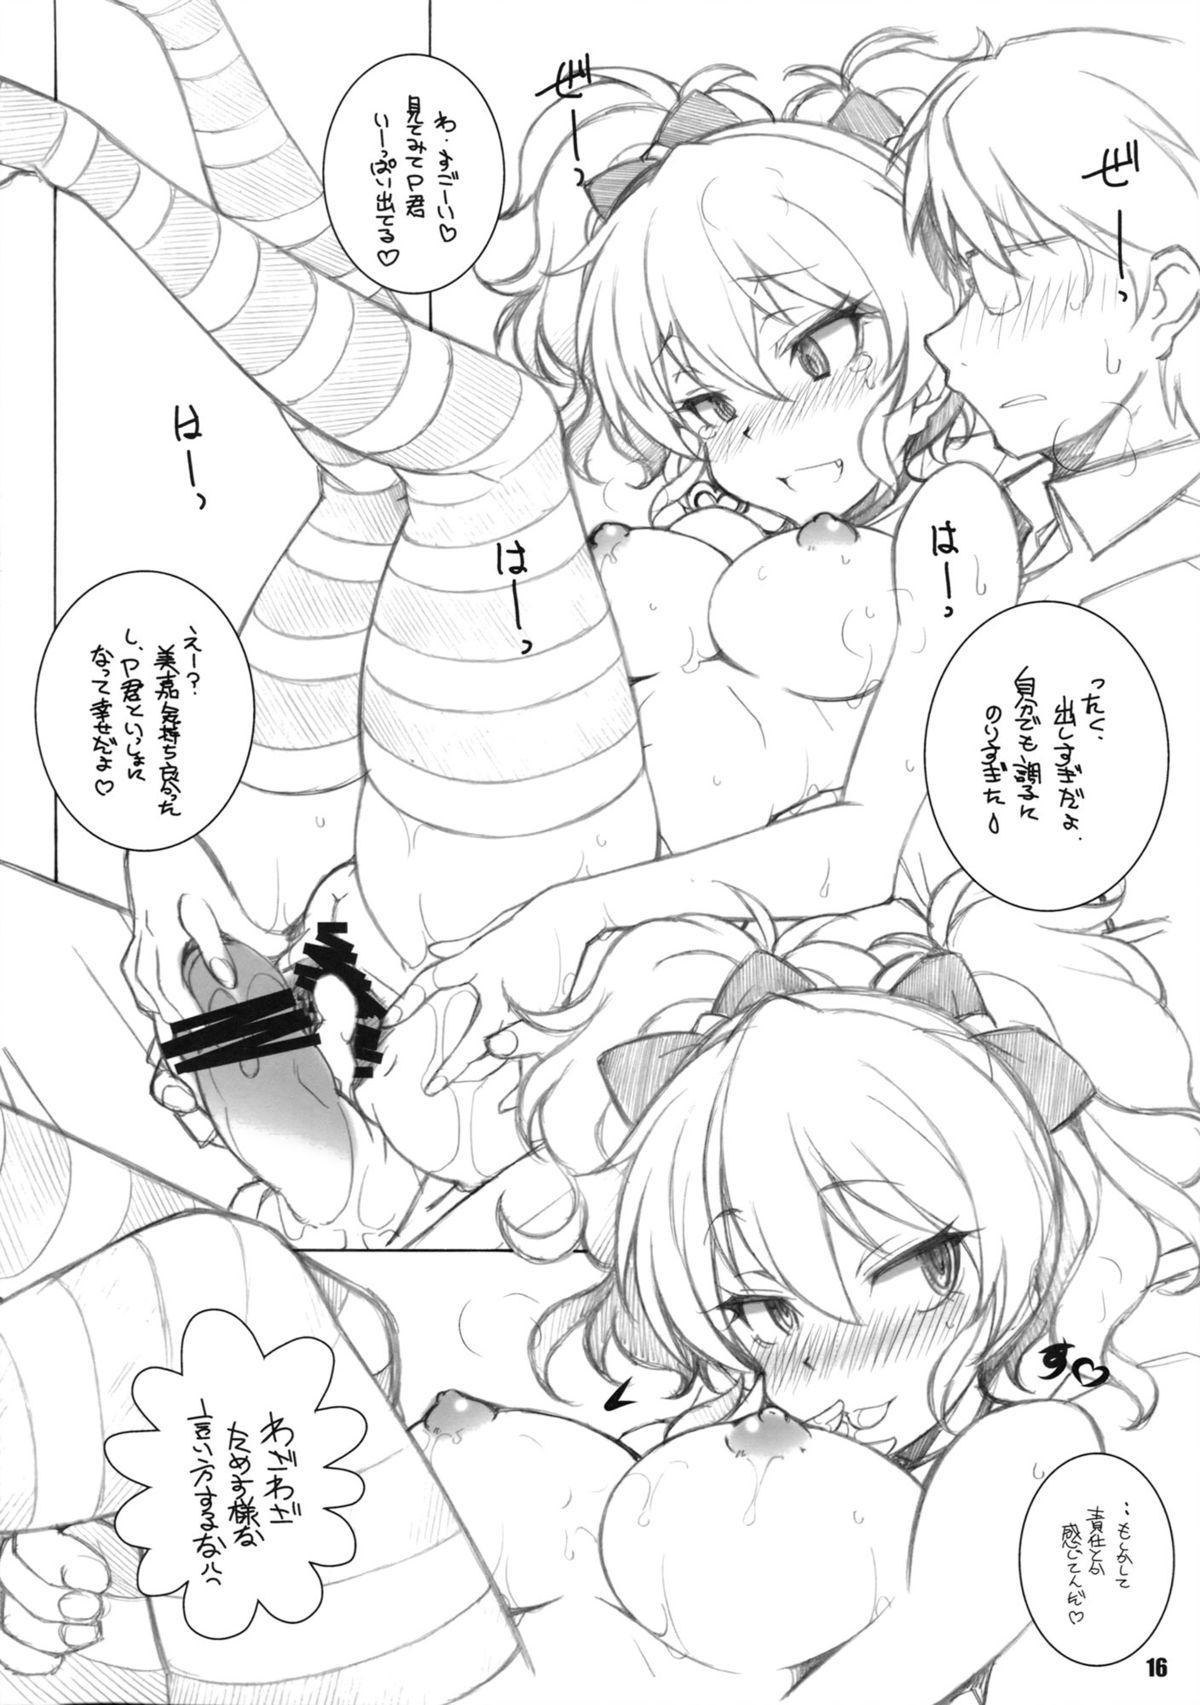 Anoko ga Hoshii!! 14